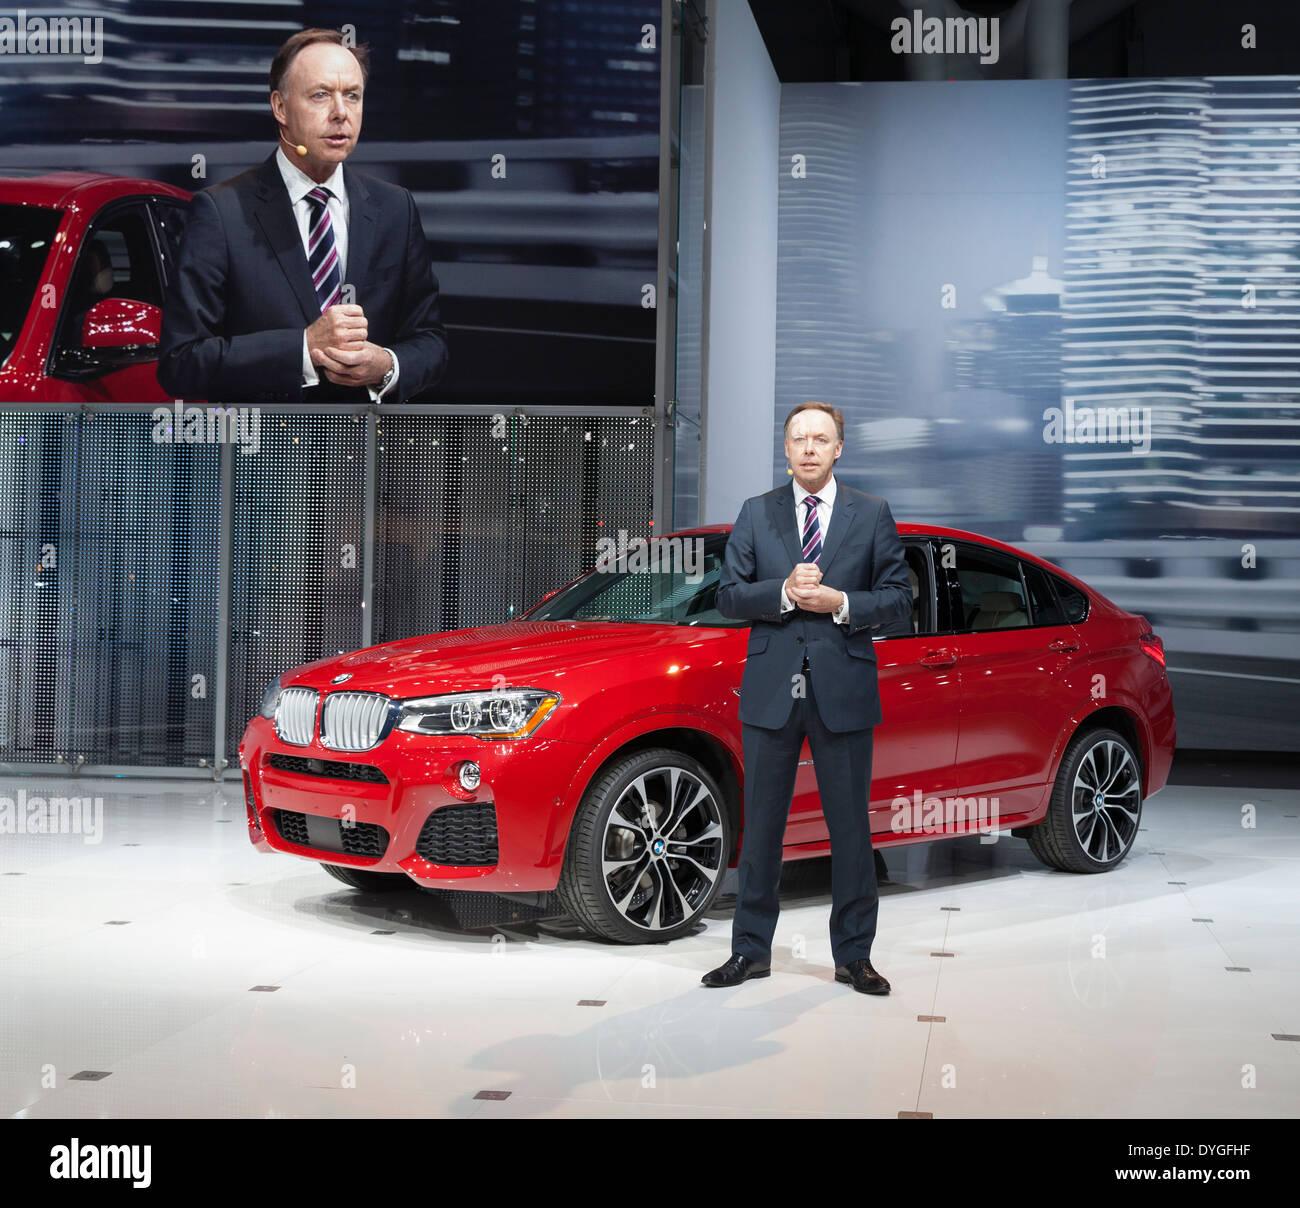 Bmw York Used Cars: Unveiling Car Stock Photos & Unveiling Car Stock Images